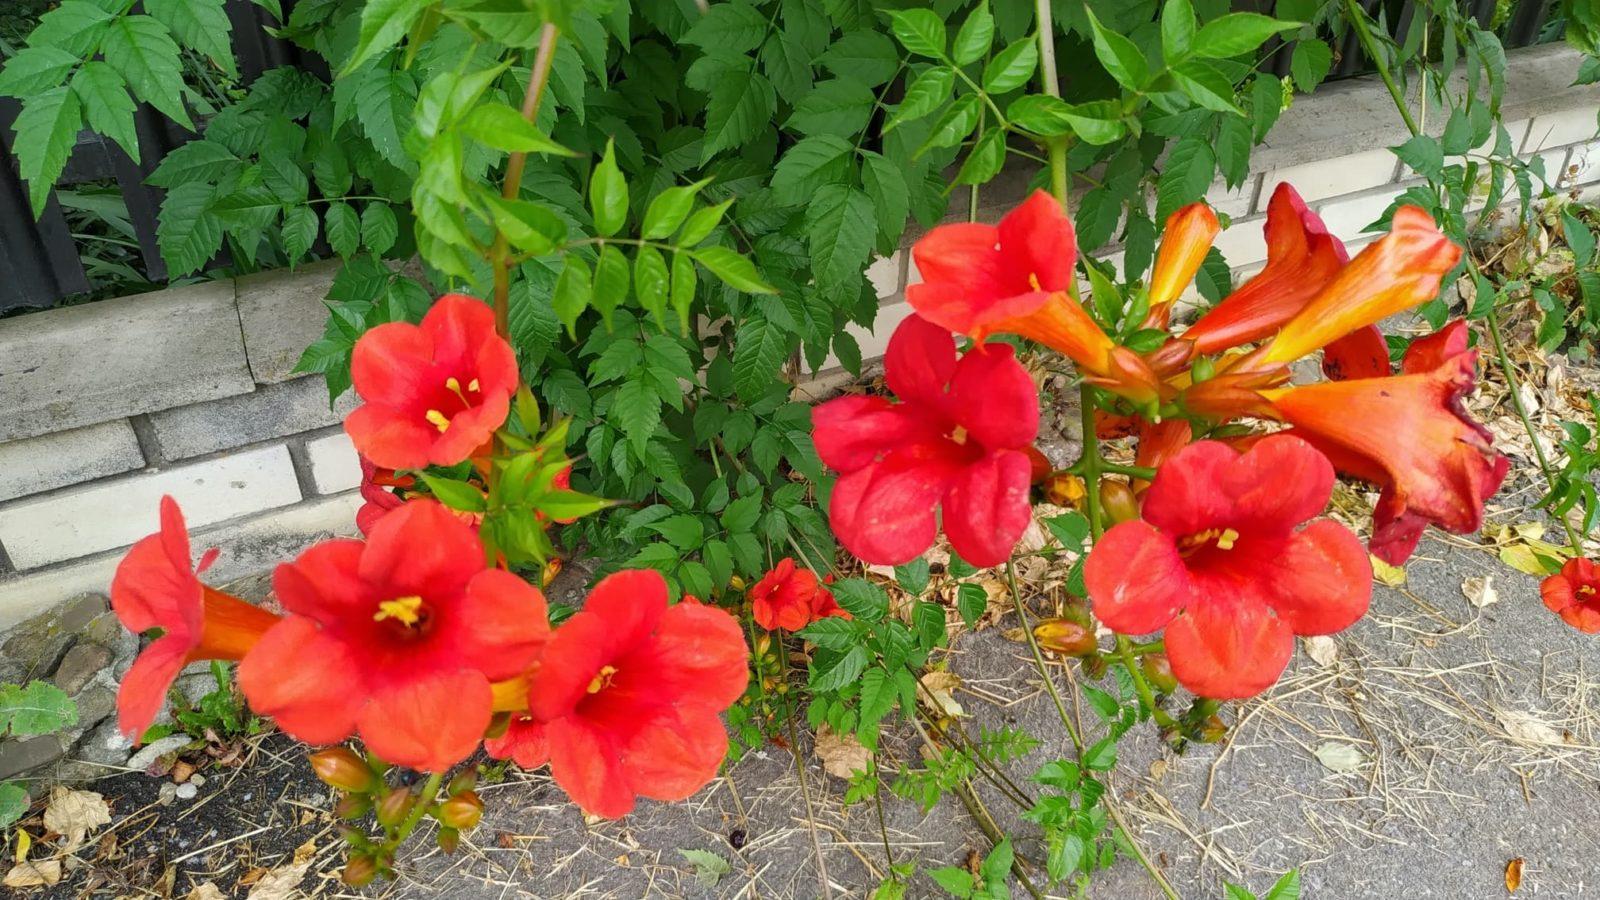 bright orange flowers of campsis vines